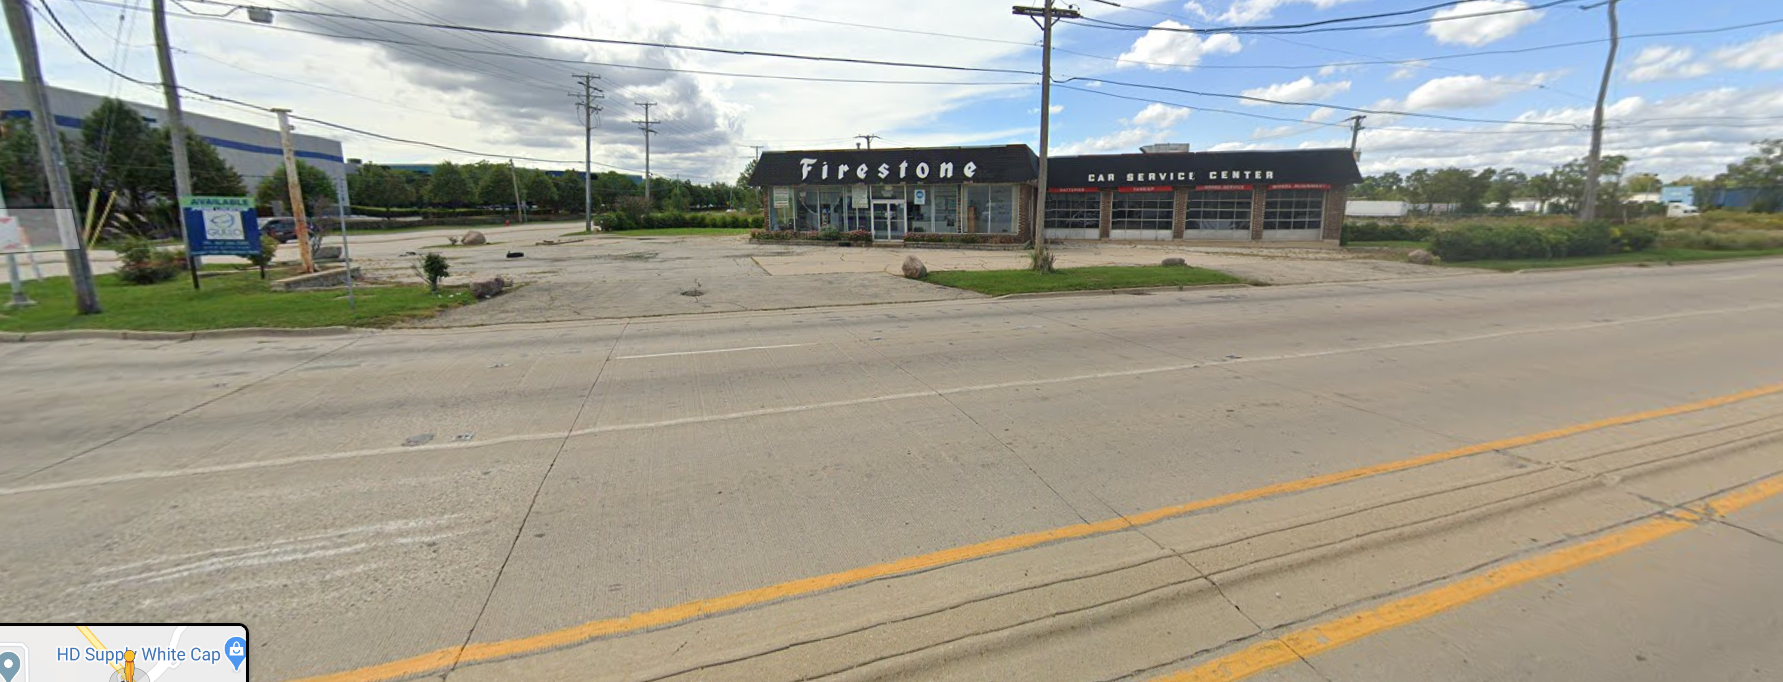 Existing Firestone Building